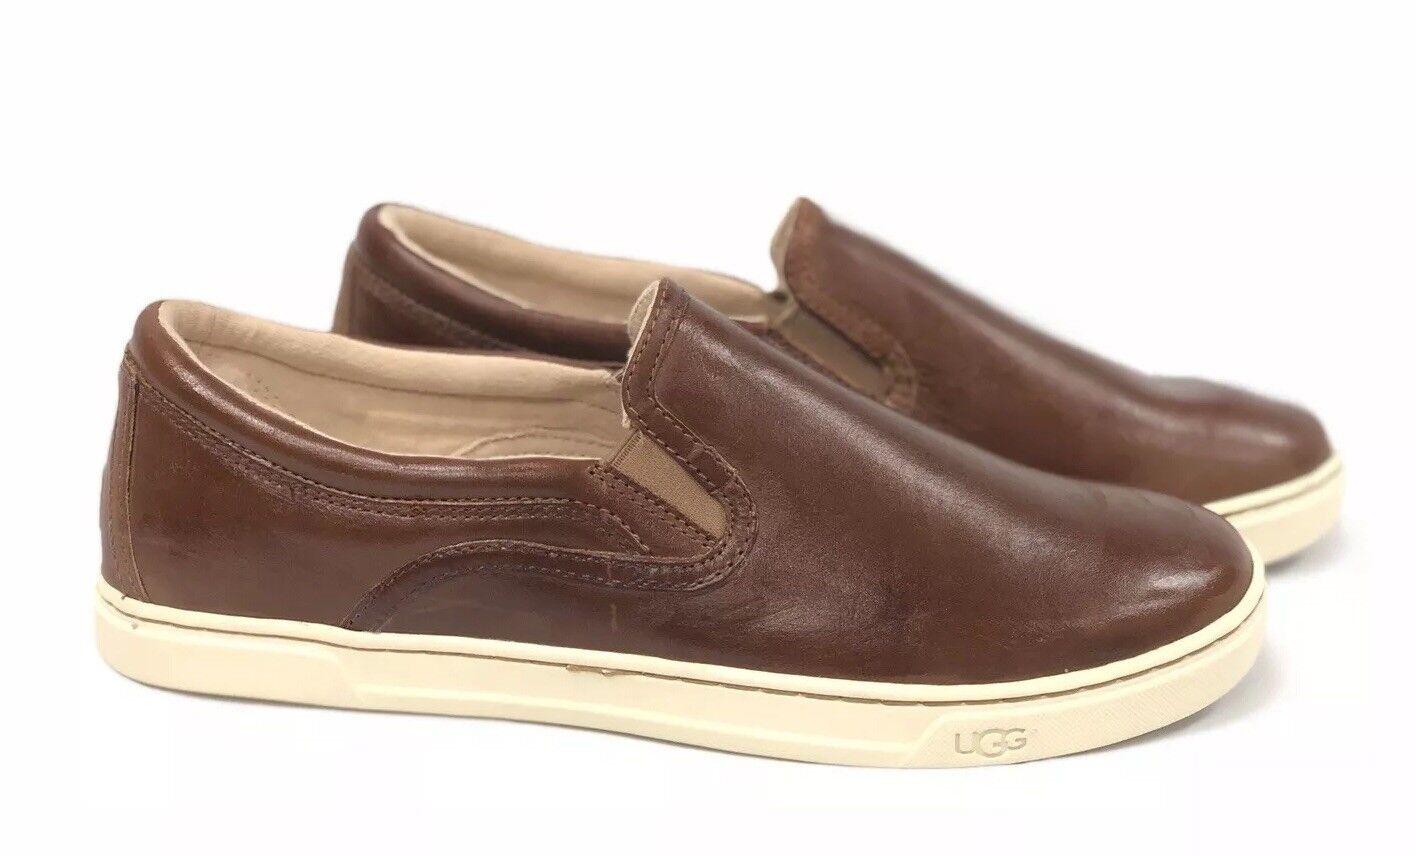 Ugg Australia - Wildes Leder mit Slip-On-Sneakers Chestnut Loafers Schuhe 1015460